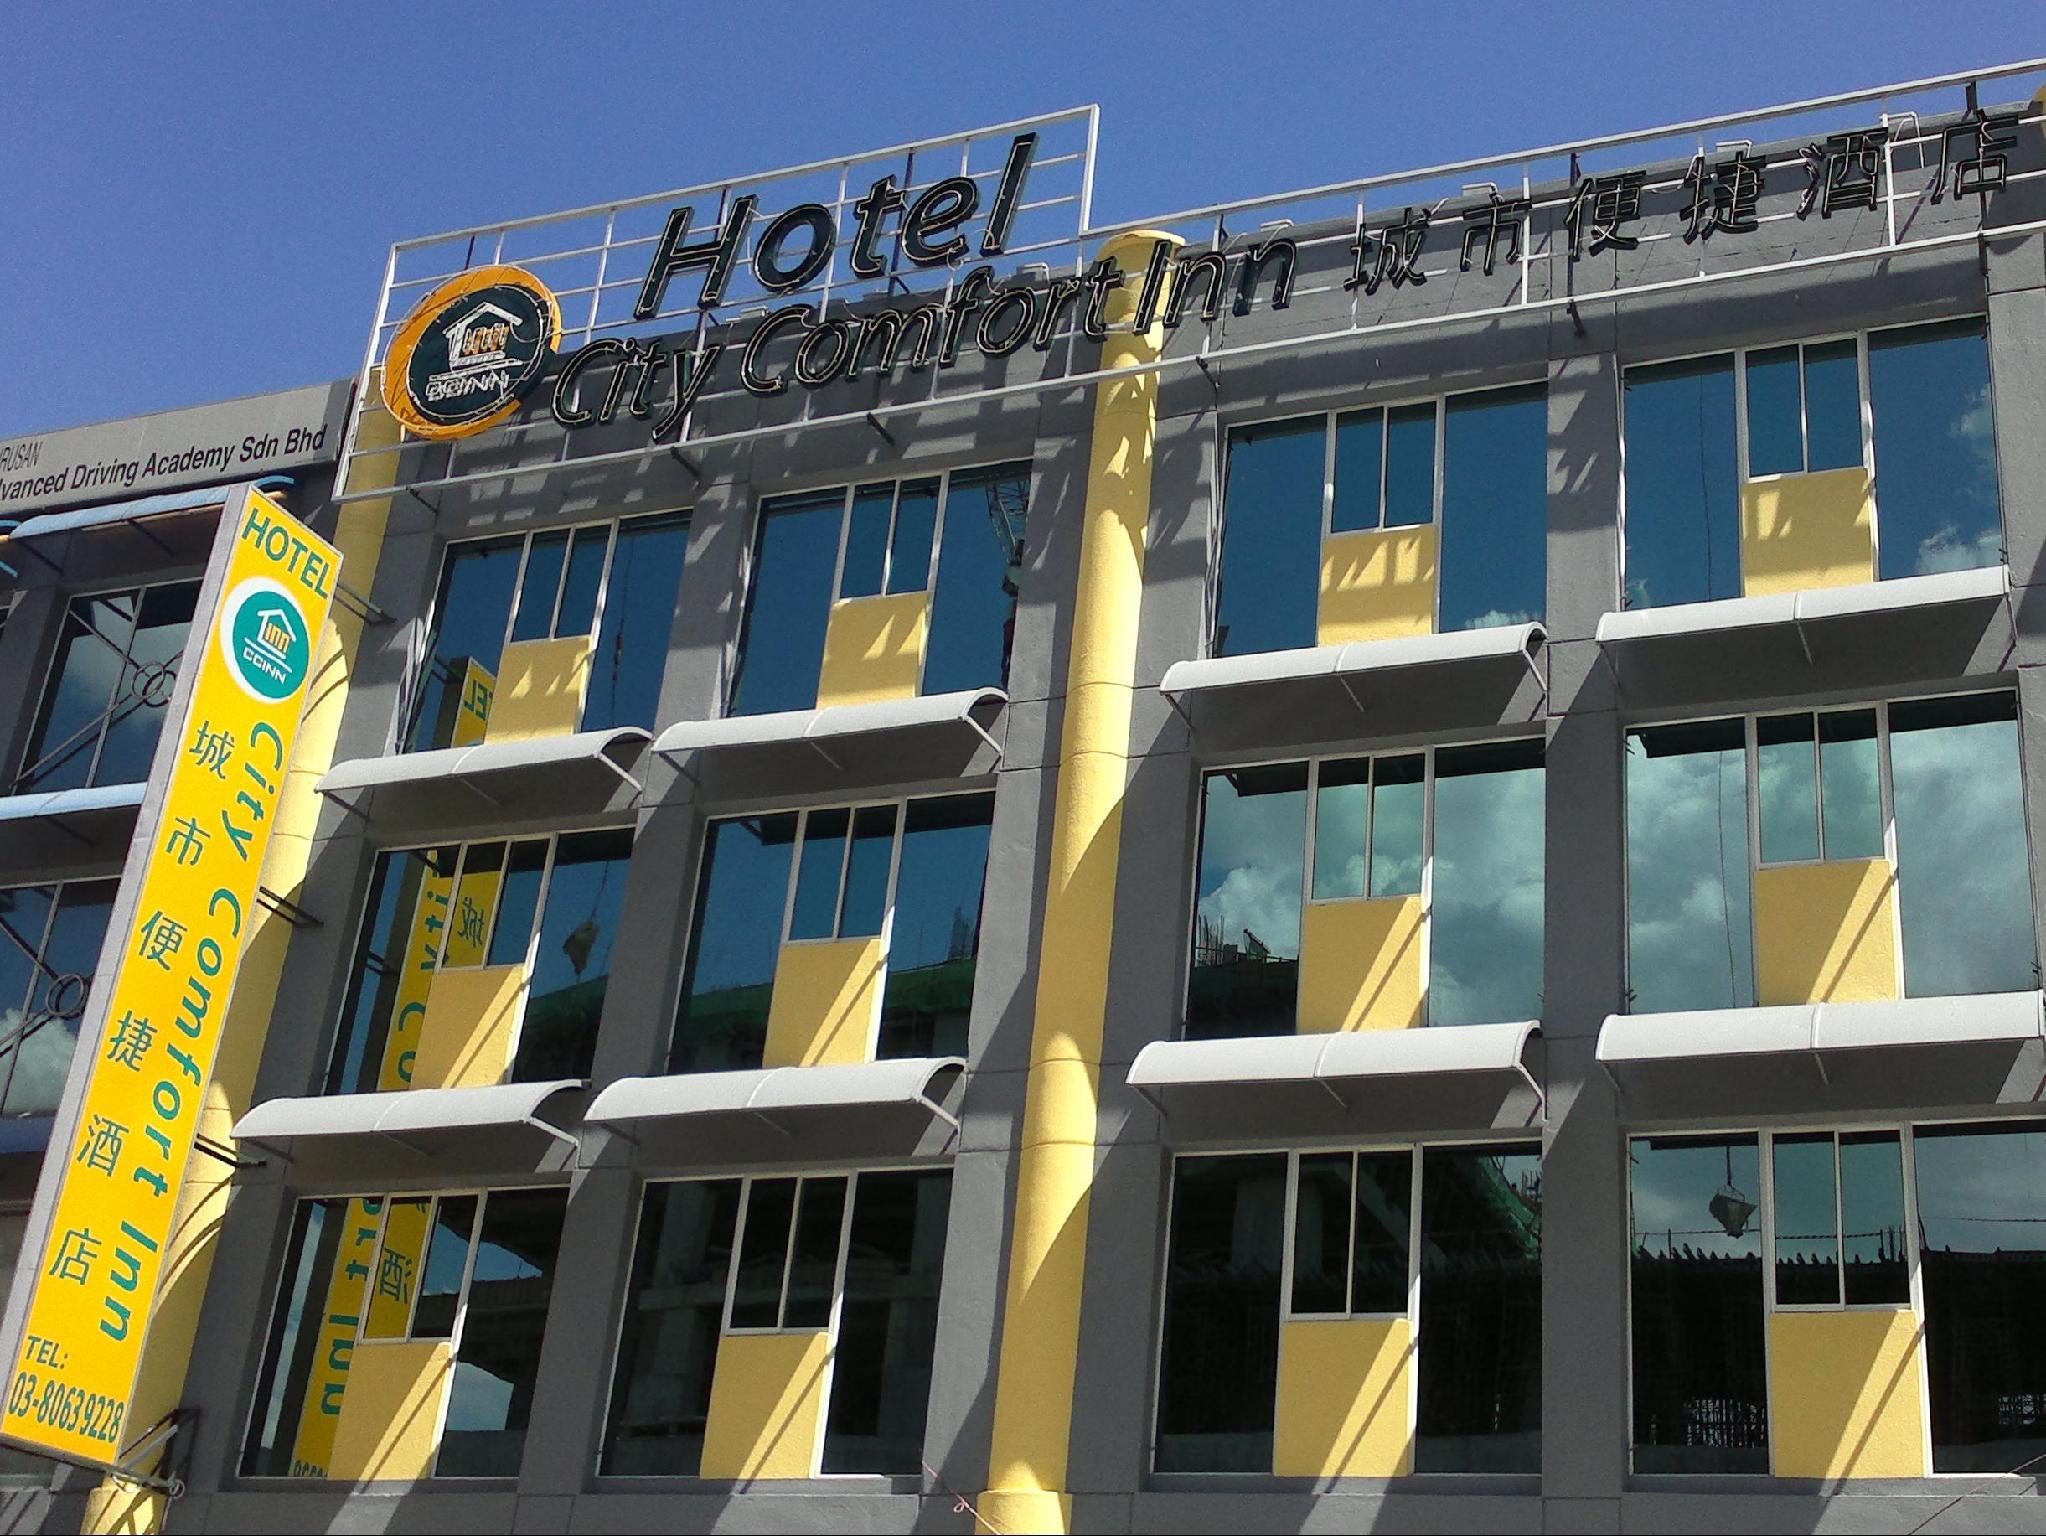 Hotel City Comfort Inn, Kuala Lumpur